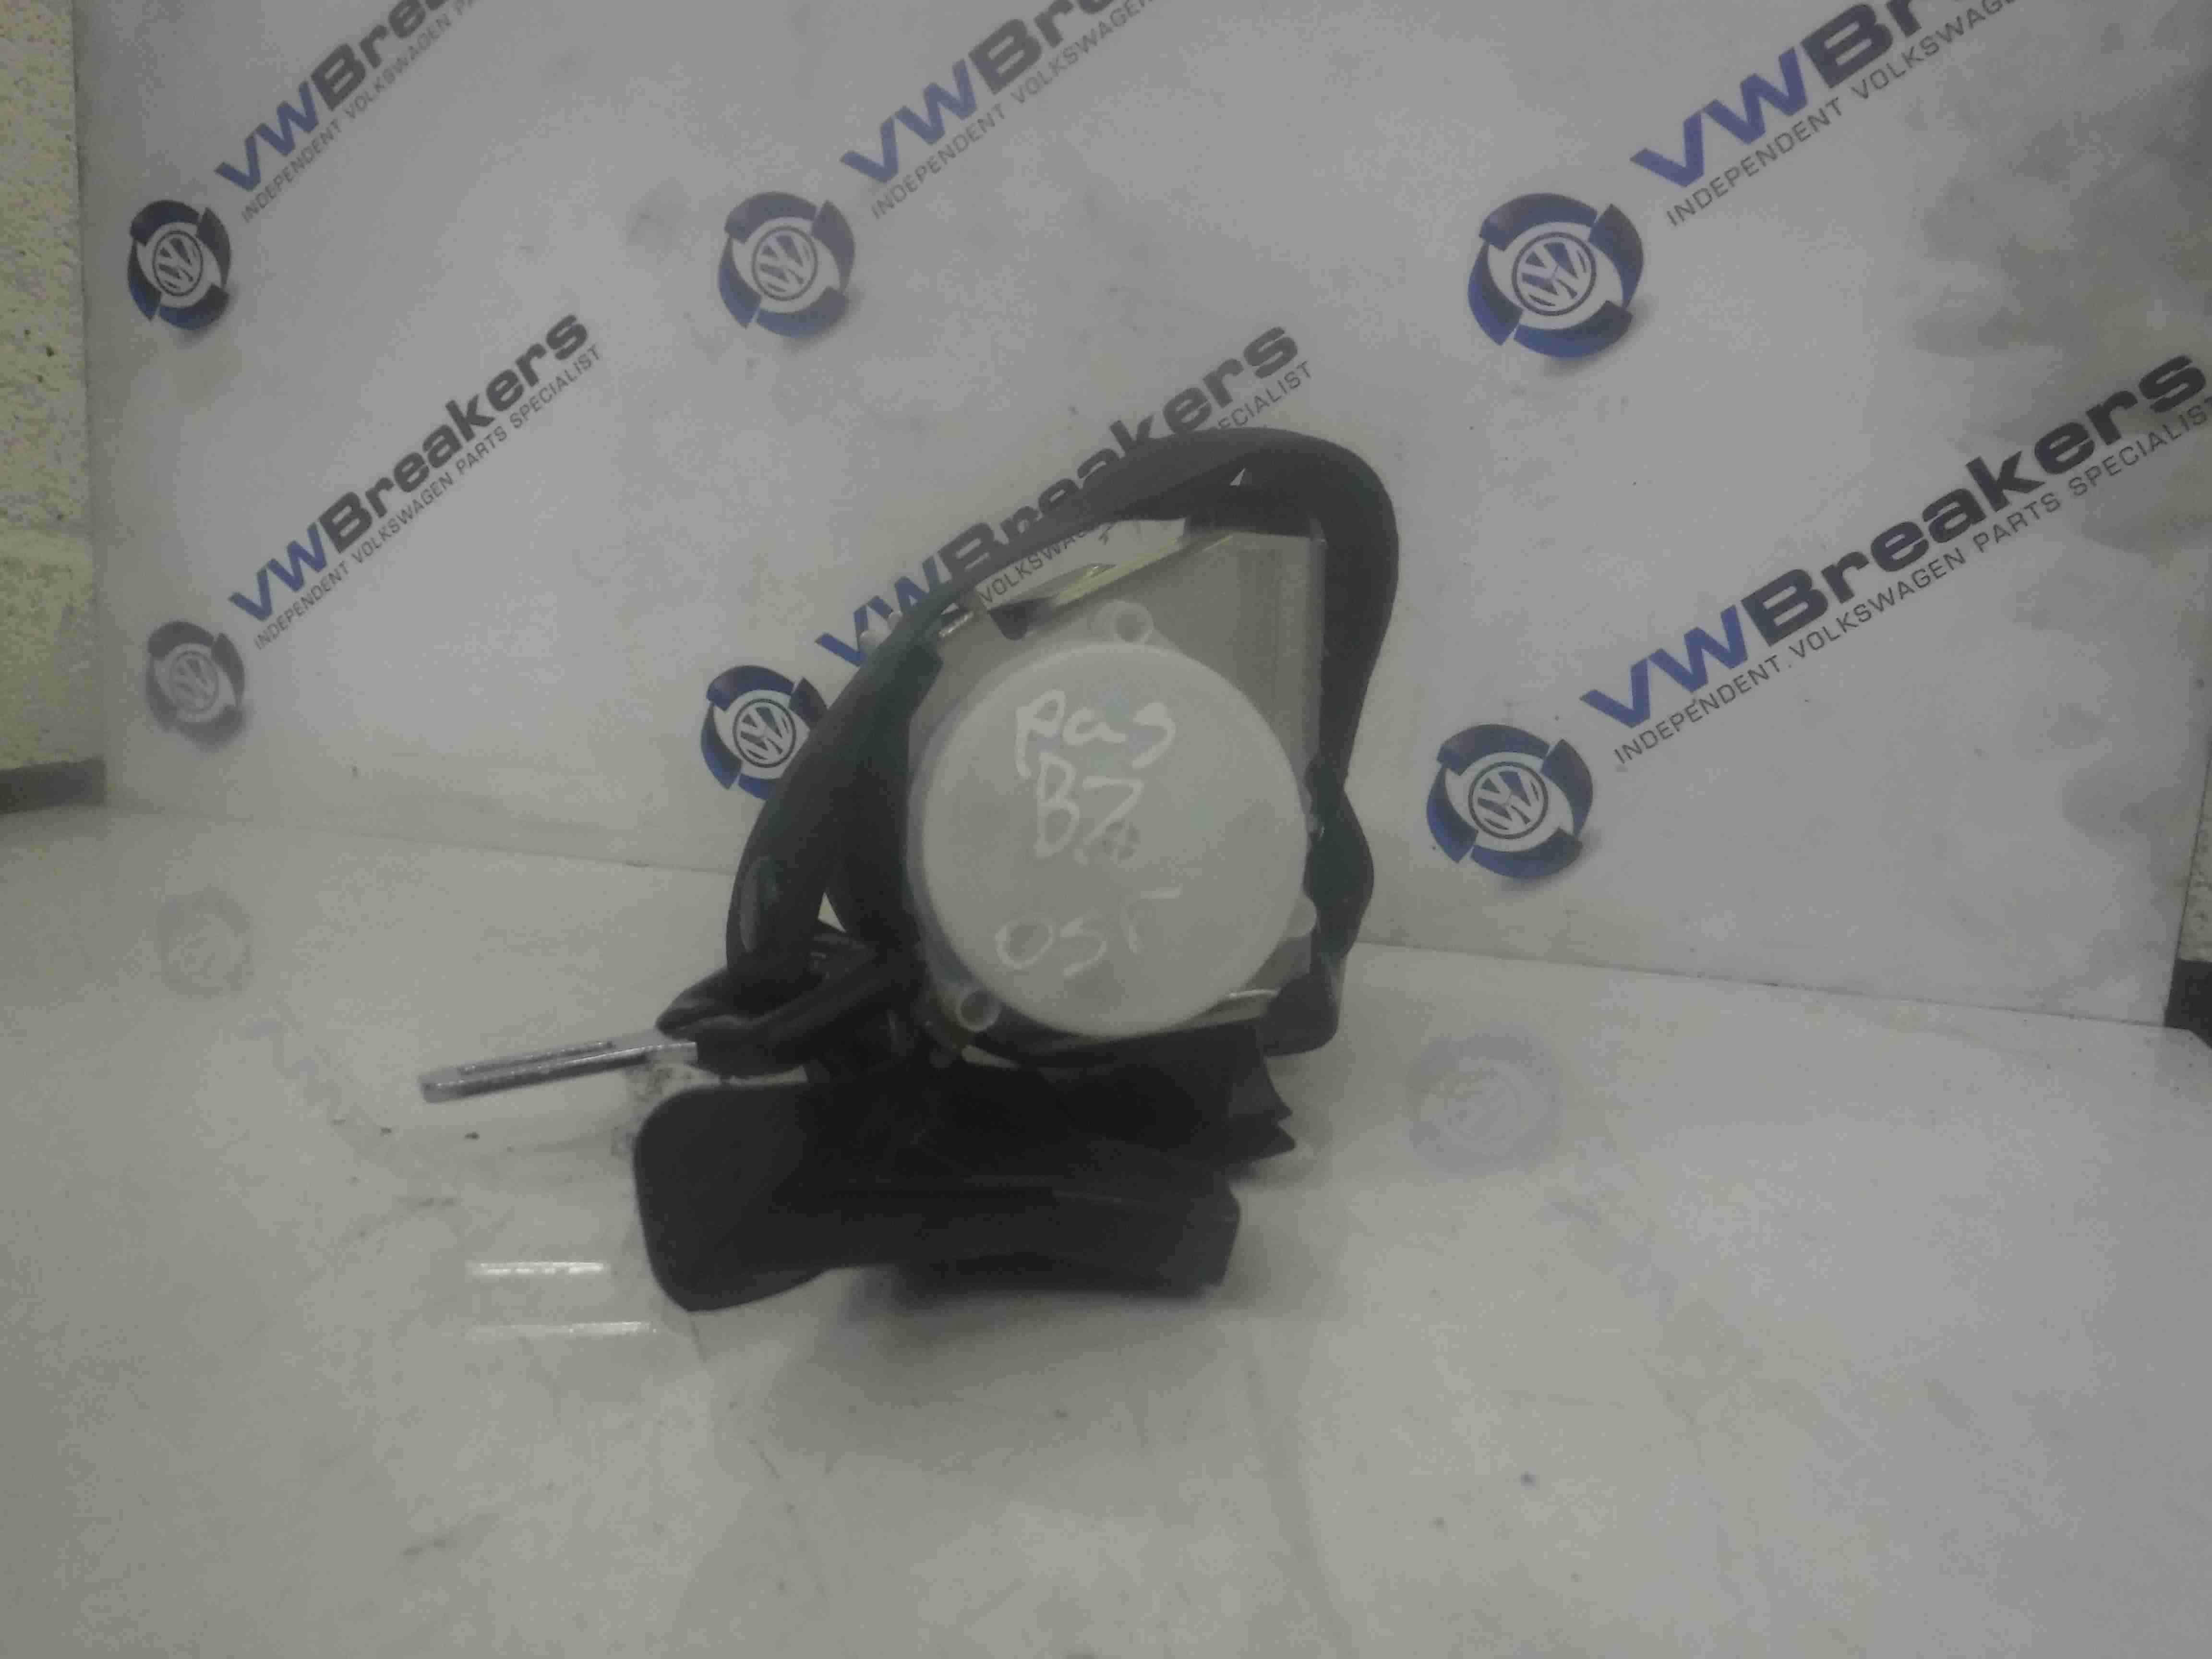 Volkswagen Passat B7 2010-2015 Drivers OSR Rear Seat Belt